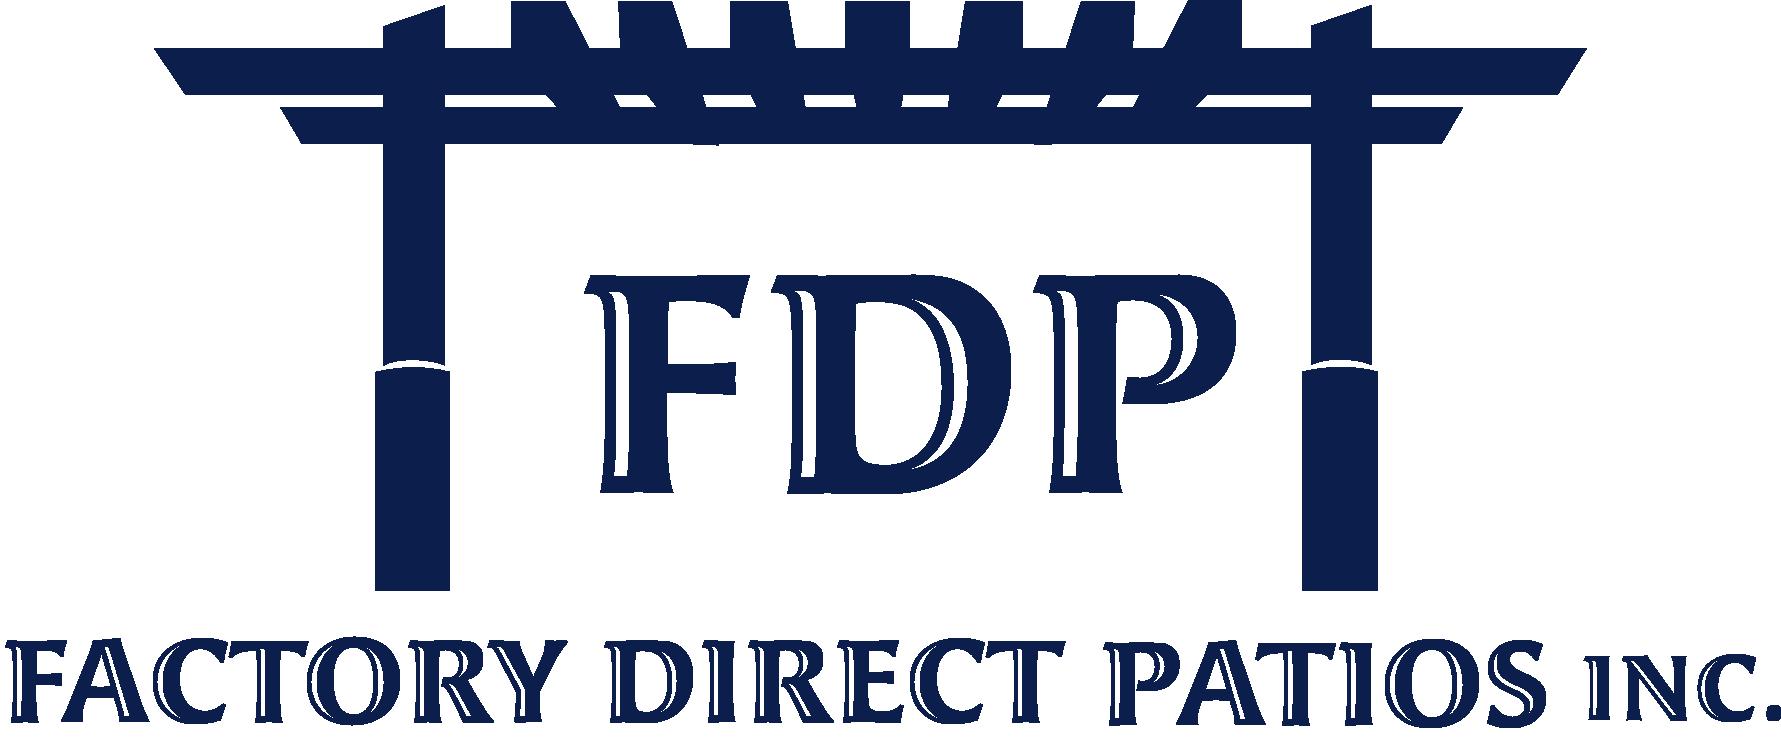 factory direct patios logo